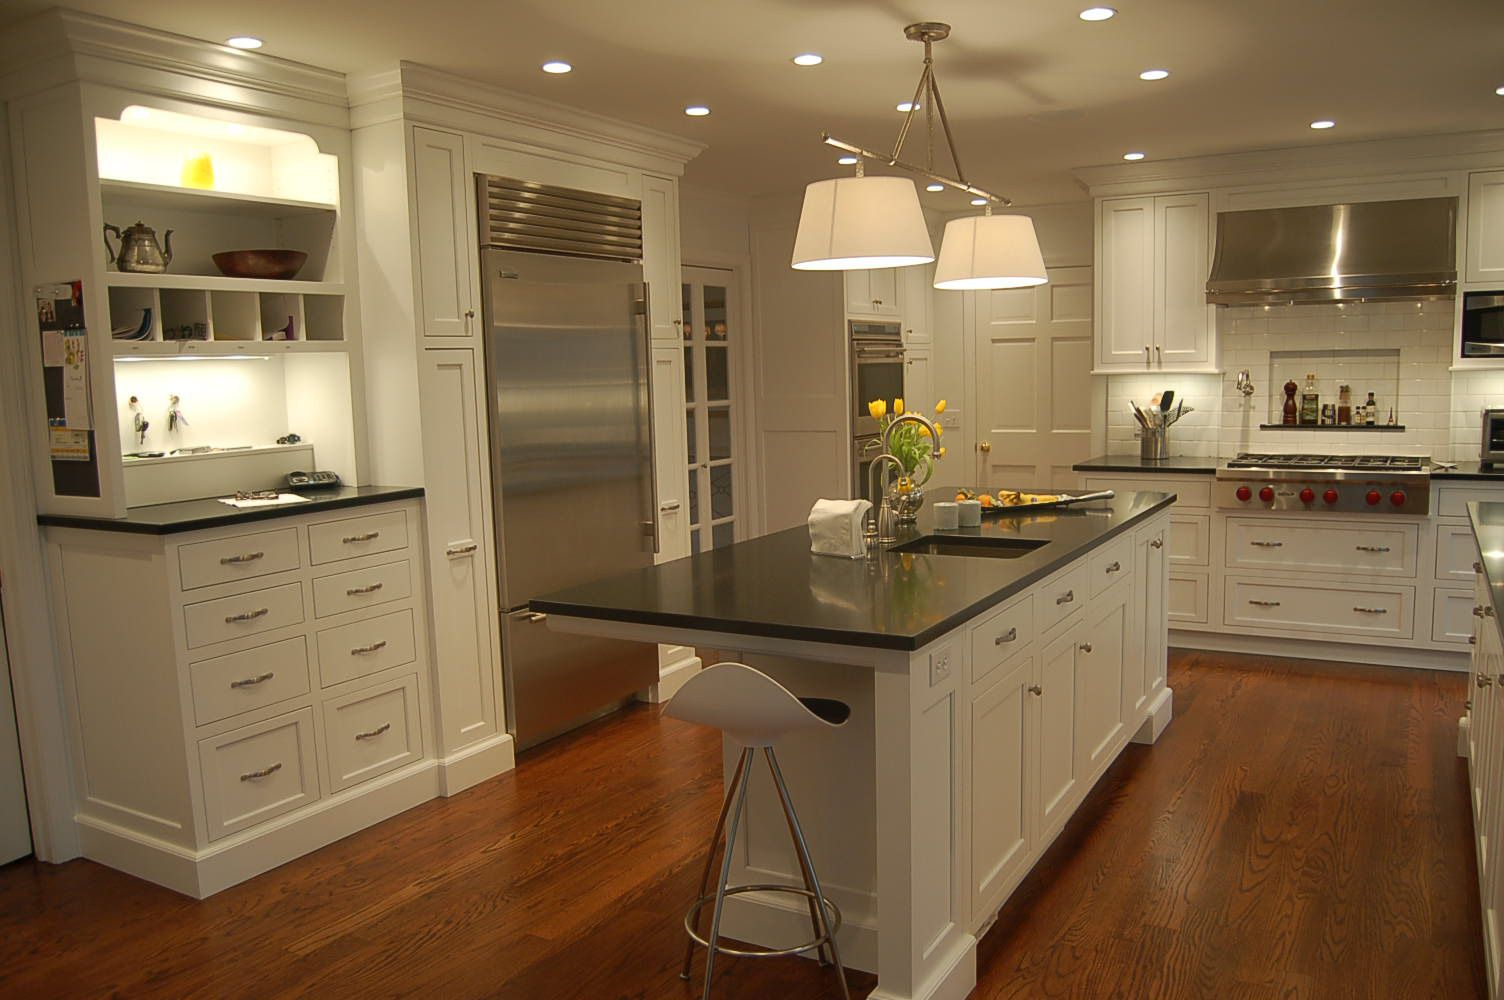 Plain Fancy Shaker Kitchen Cabinets Wonderfully White Plain Fancy Custom Cabinetry Luxury Kitchen Design Kitchen Cabinet Styles White Shaker Kitchen